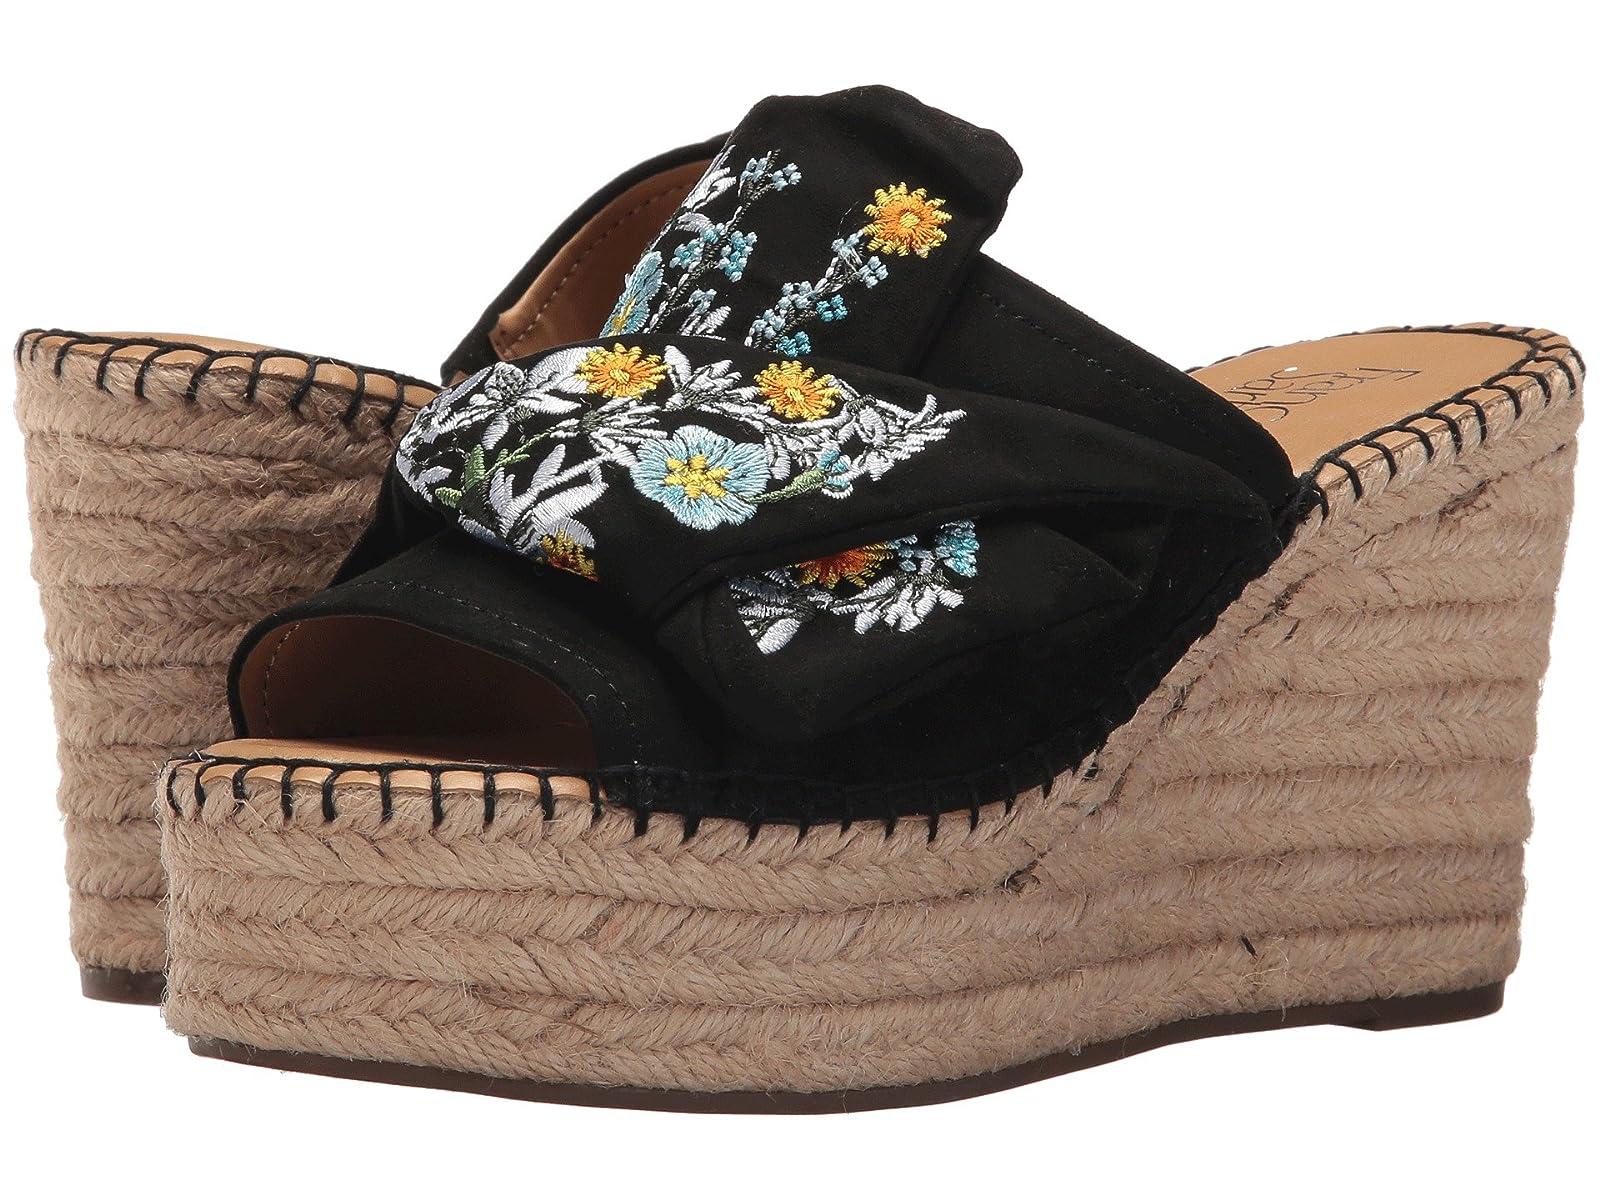 Franco Sarto TalindaCheap and distinctive eye-catching shoes